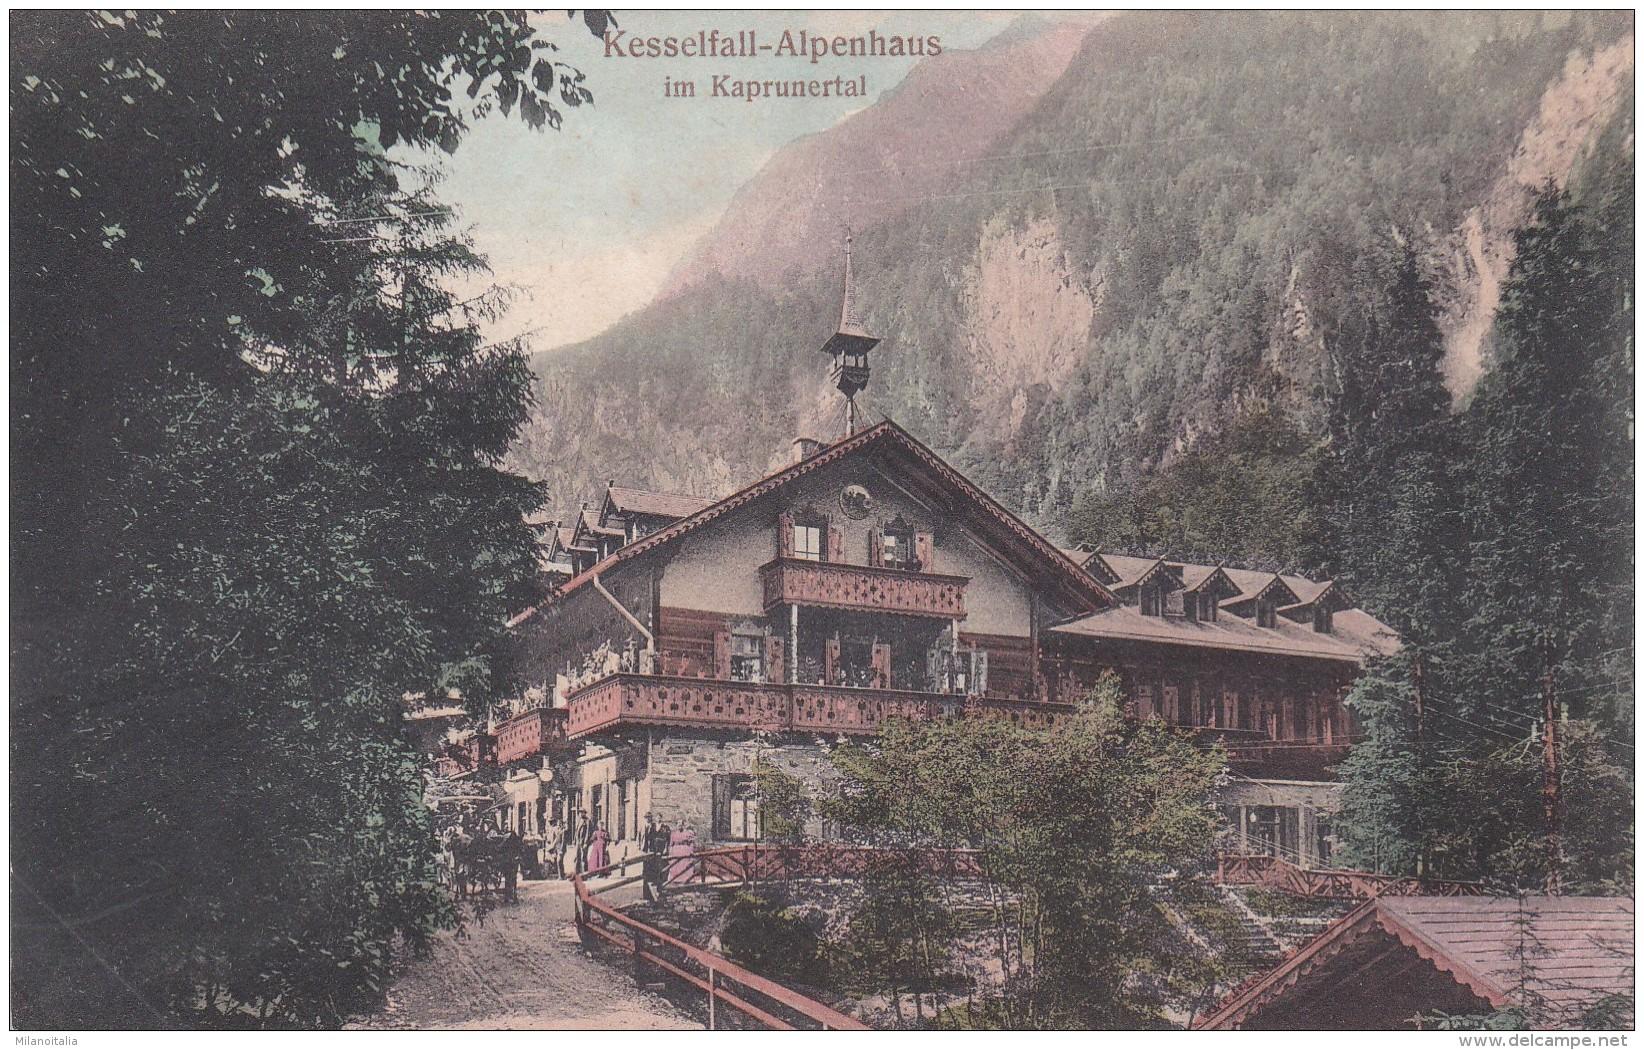 Kesselfall-Alpenhaus Im Kaprunertal (3120) - Kaprun